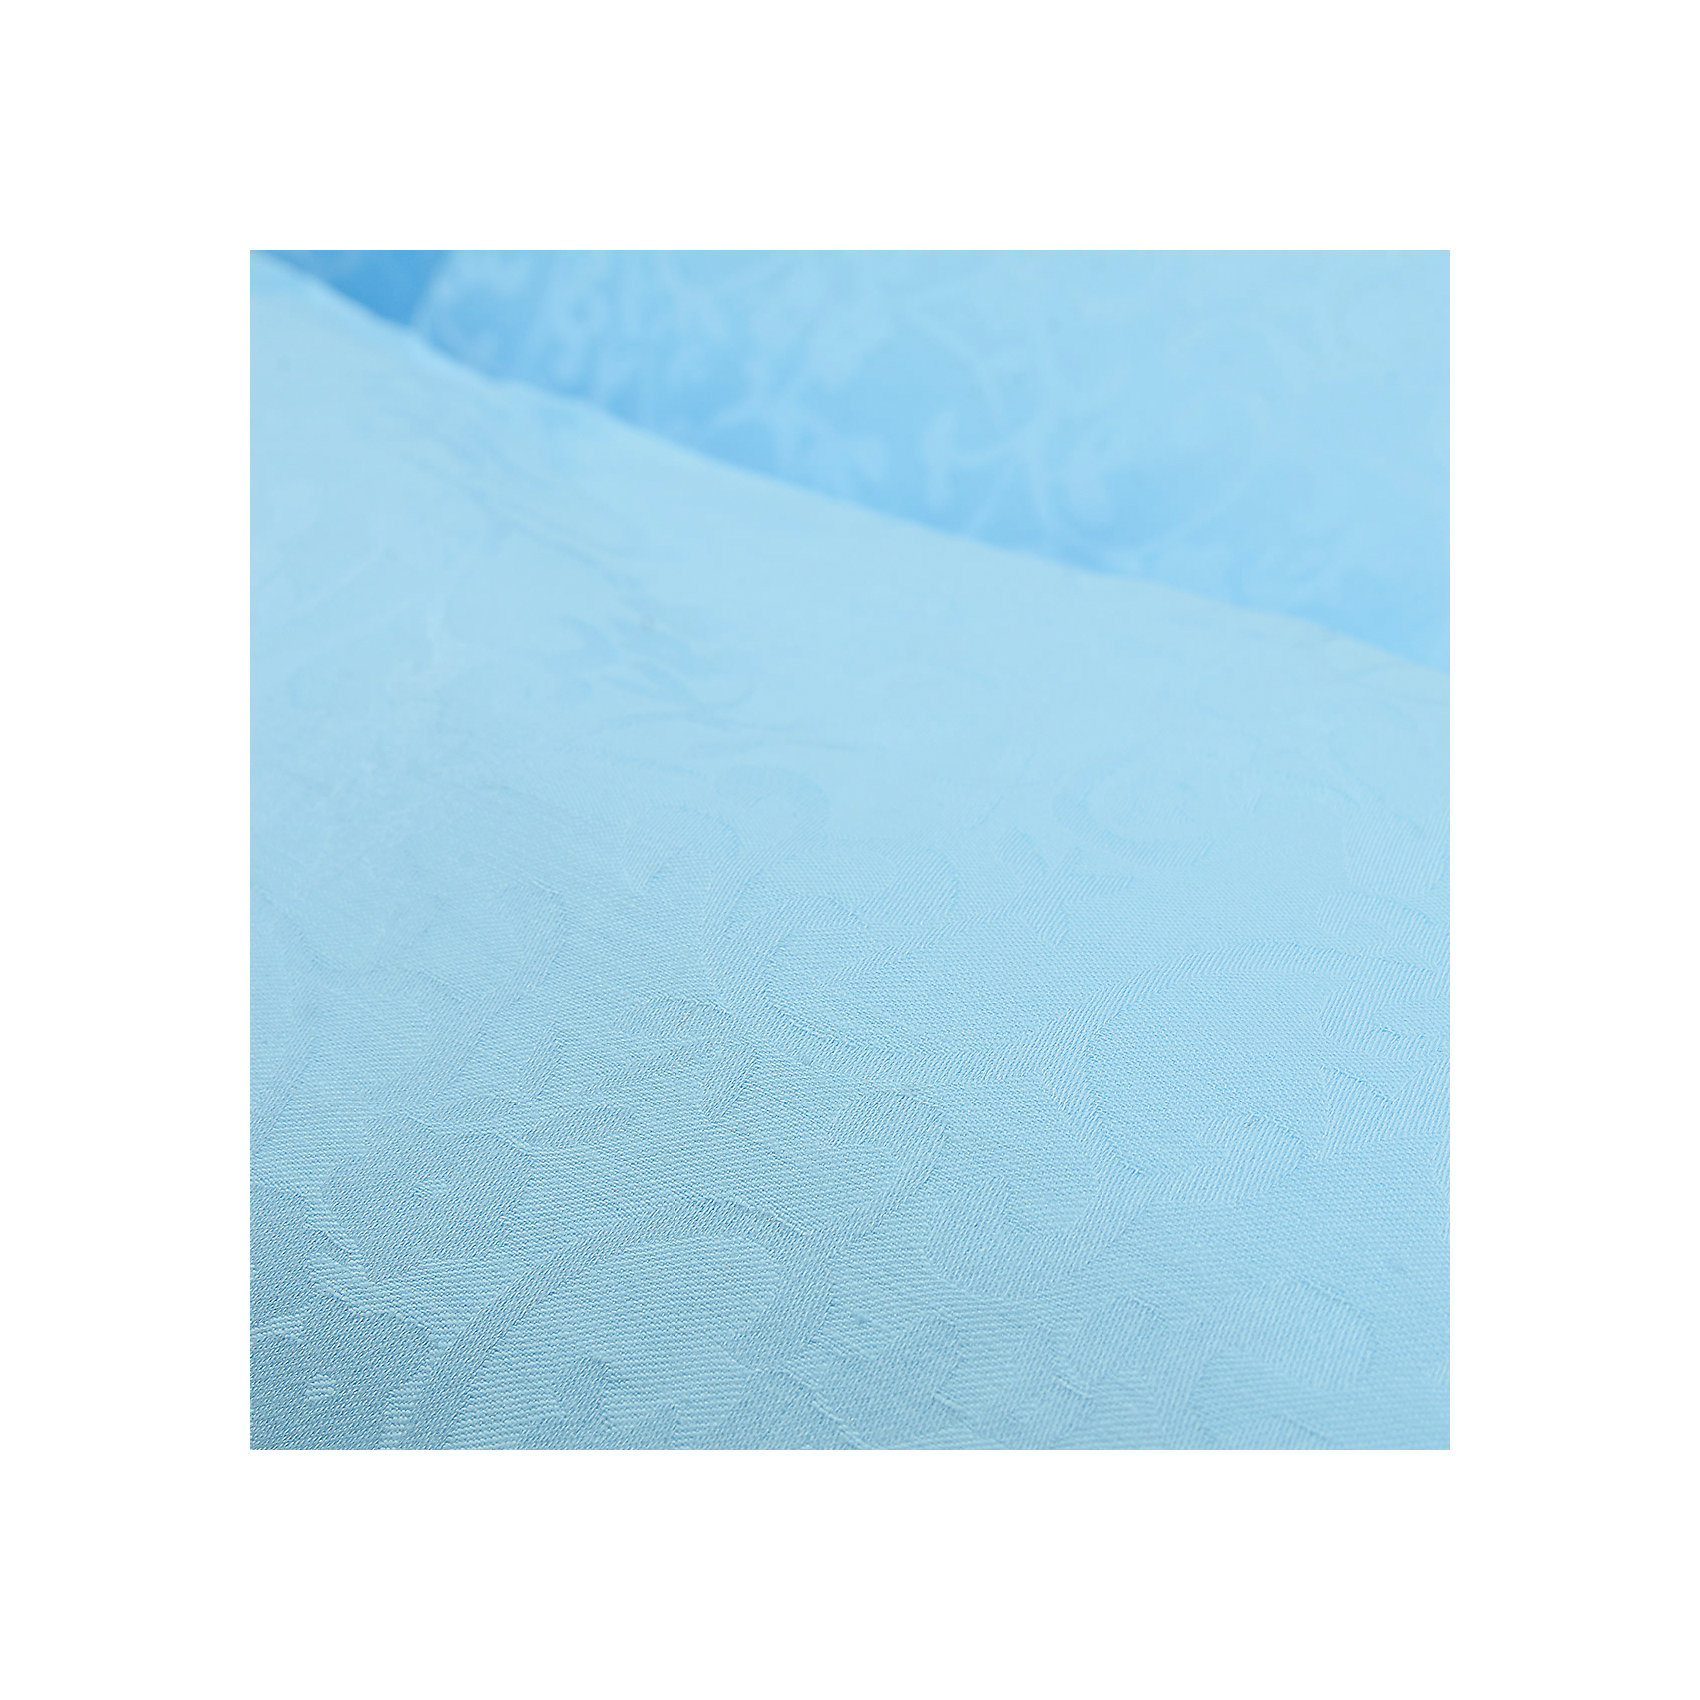 Подушка для беременных Гранда 360х38 (сатин), La Armada, голубой